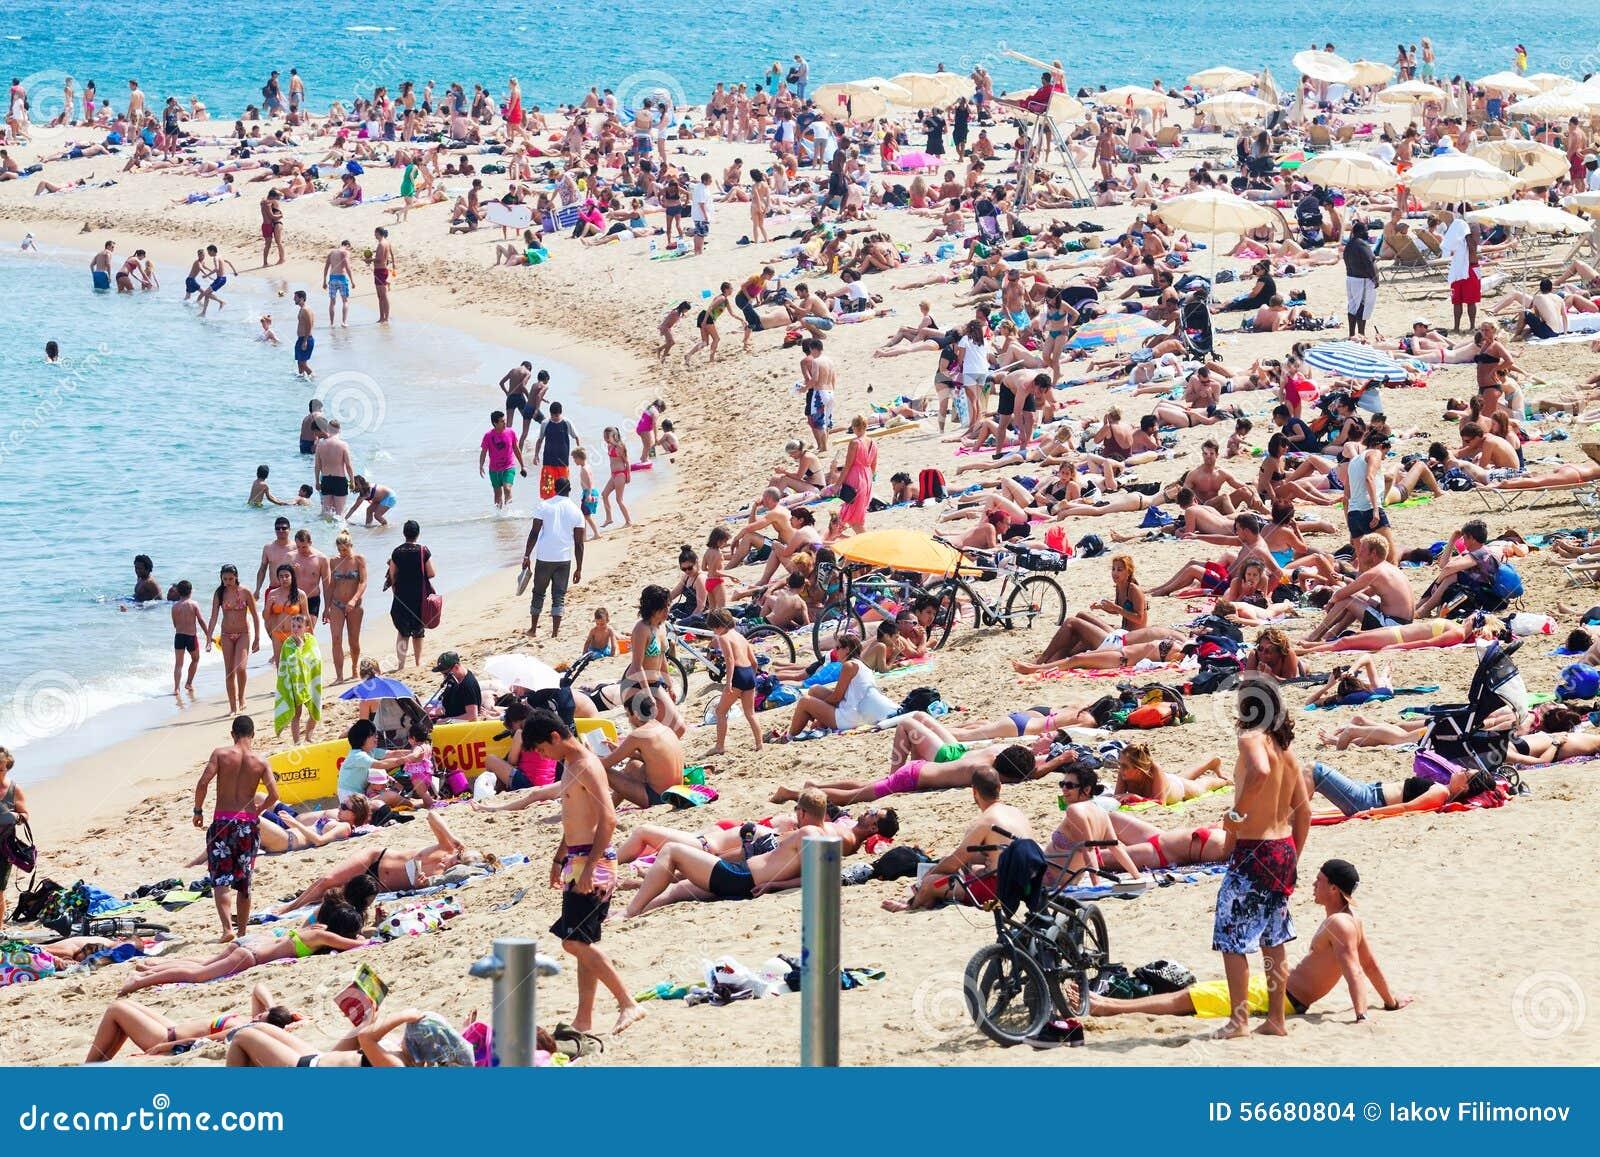 People Sunbathing On The Beach